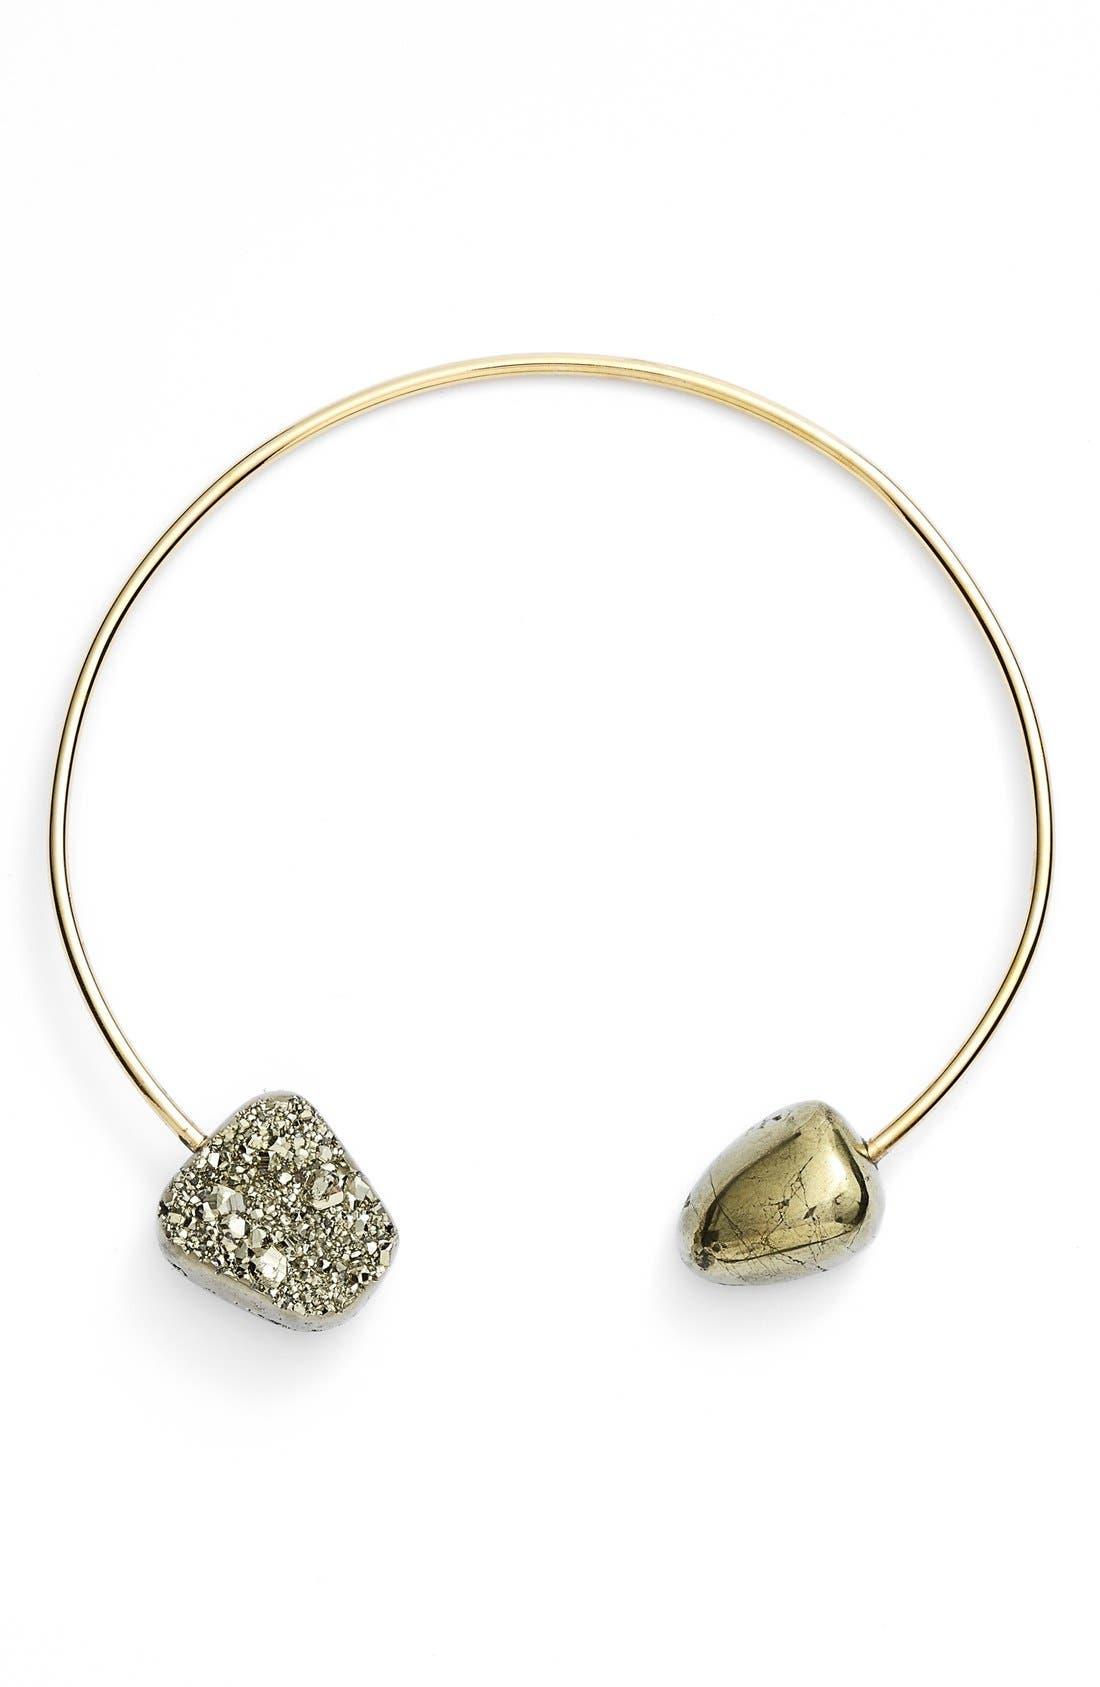 Main Image - Seraphine Design Pyrite & Semiprecious Stone Collar Necklace